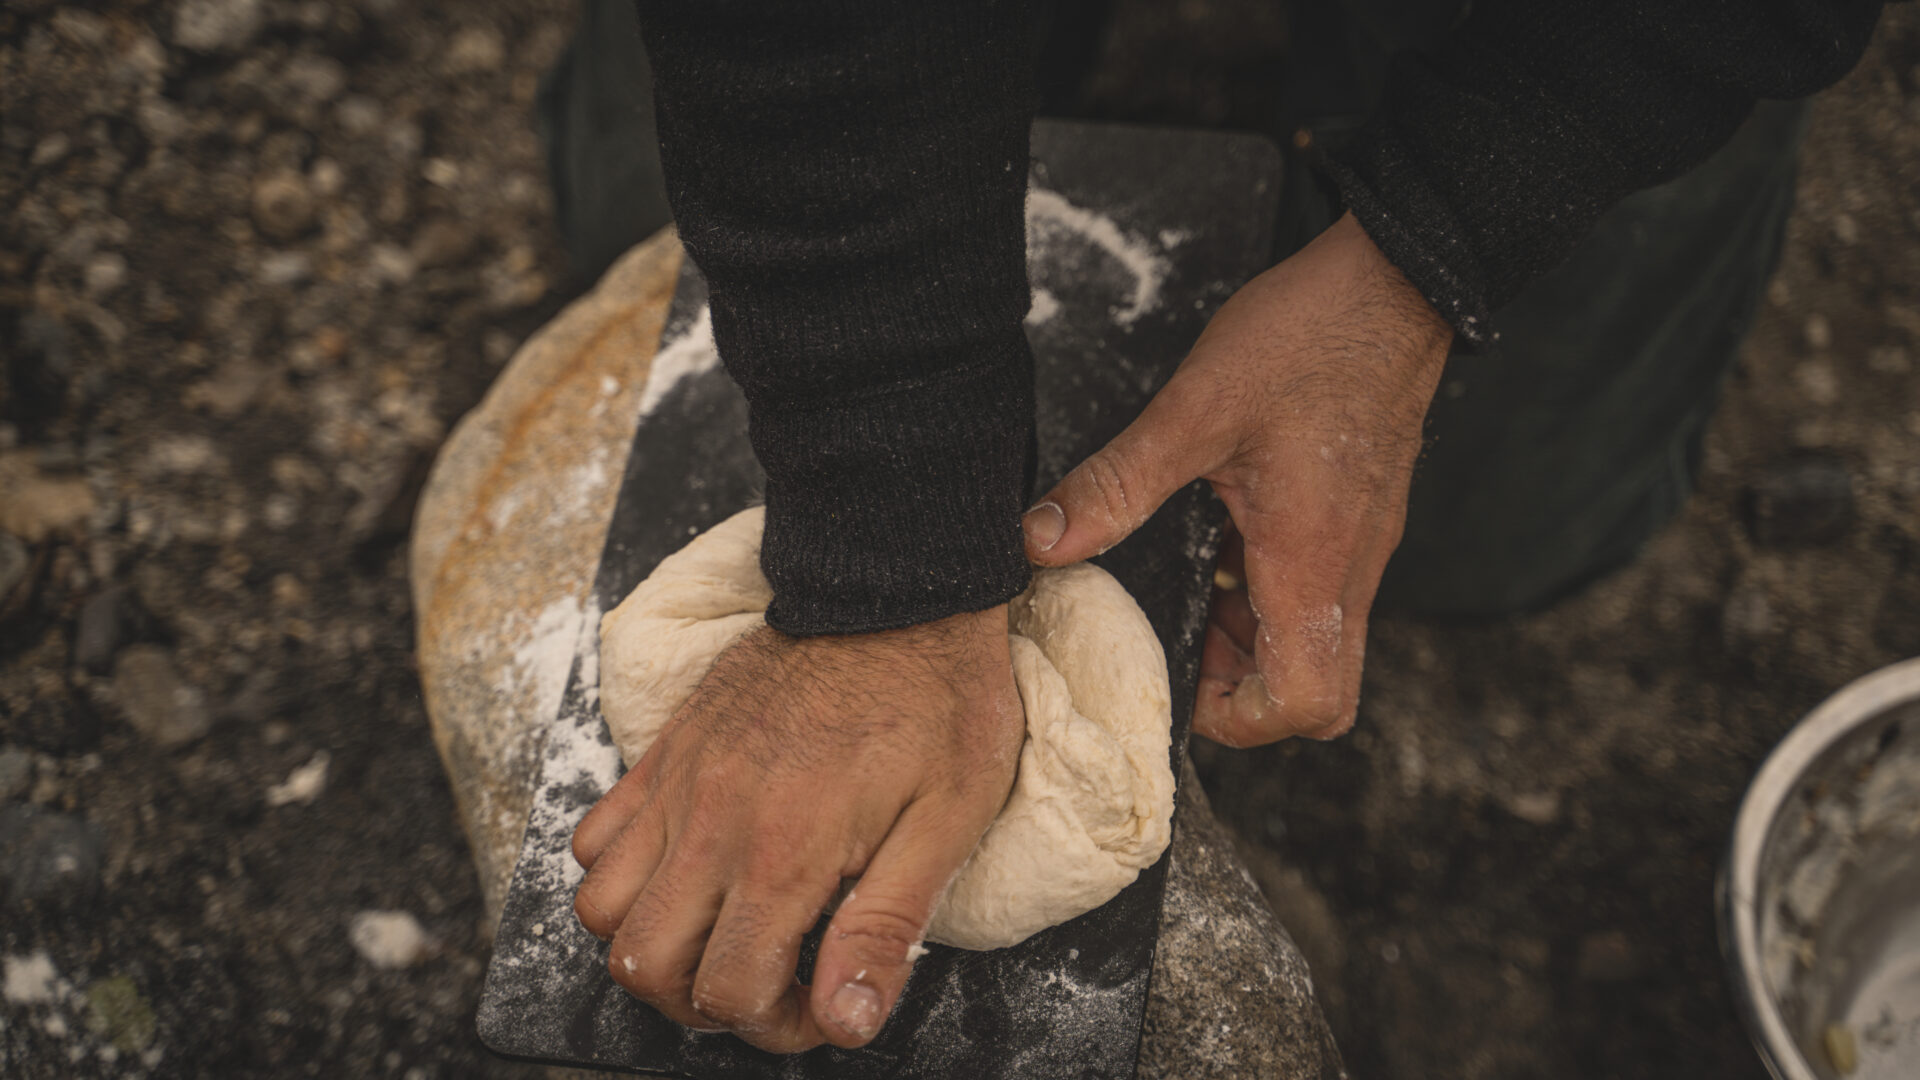 Fireside focaccia bread is no easy task, but the results are worth it. Photo by Cody Preston @codywpreston.